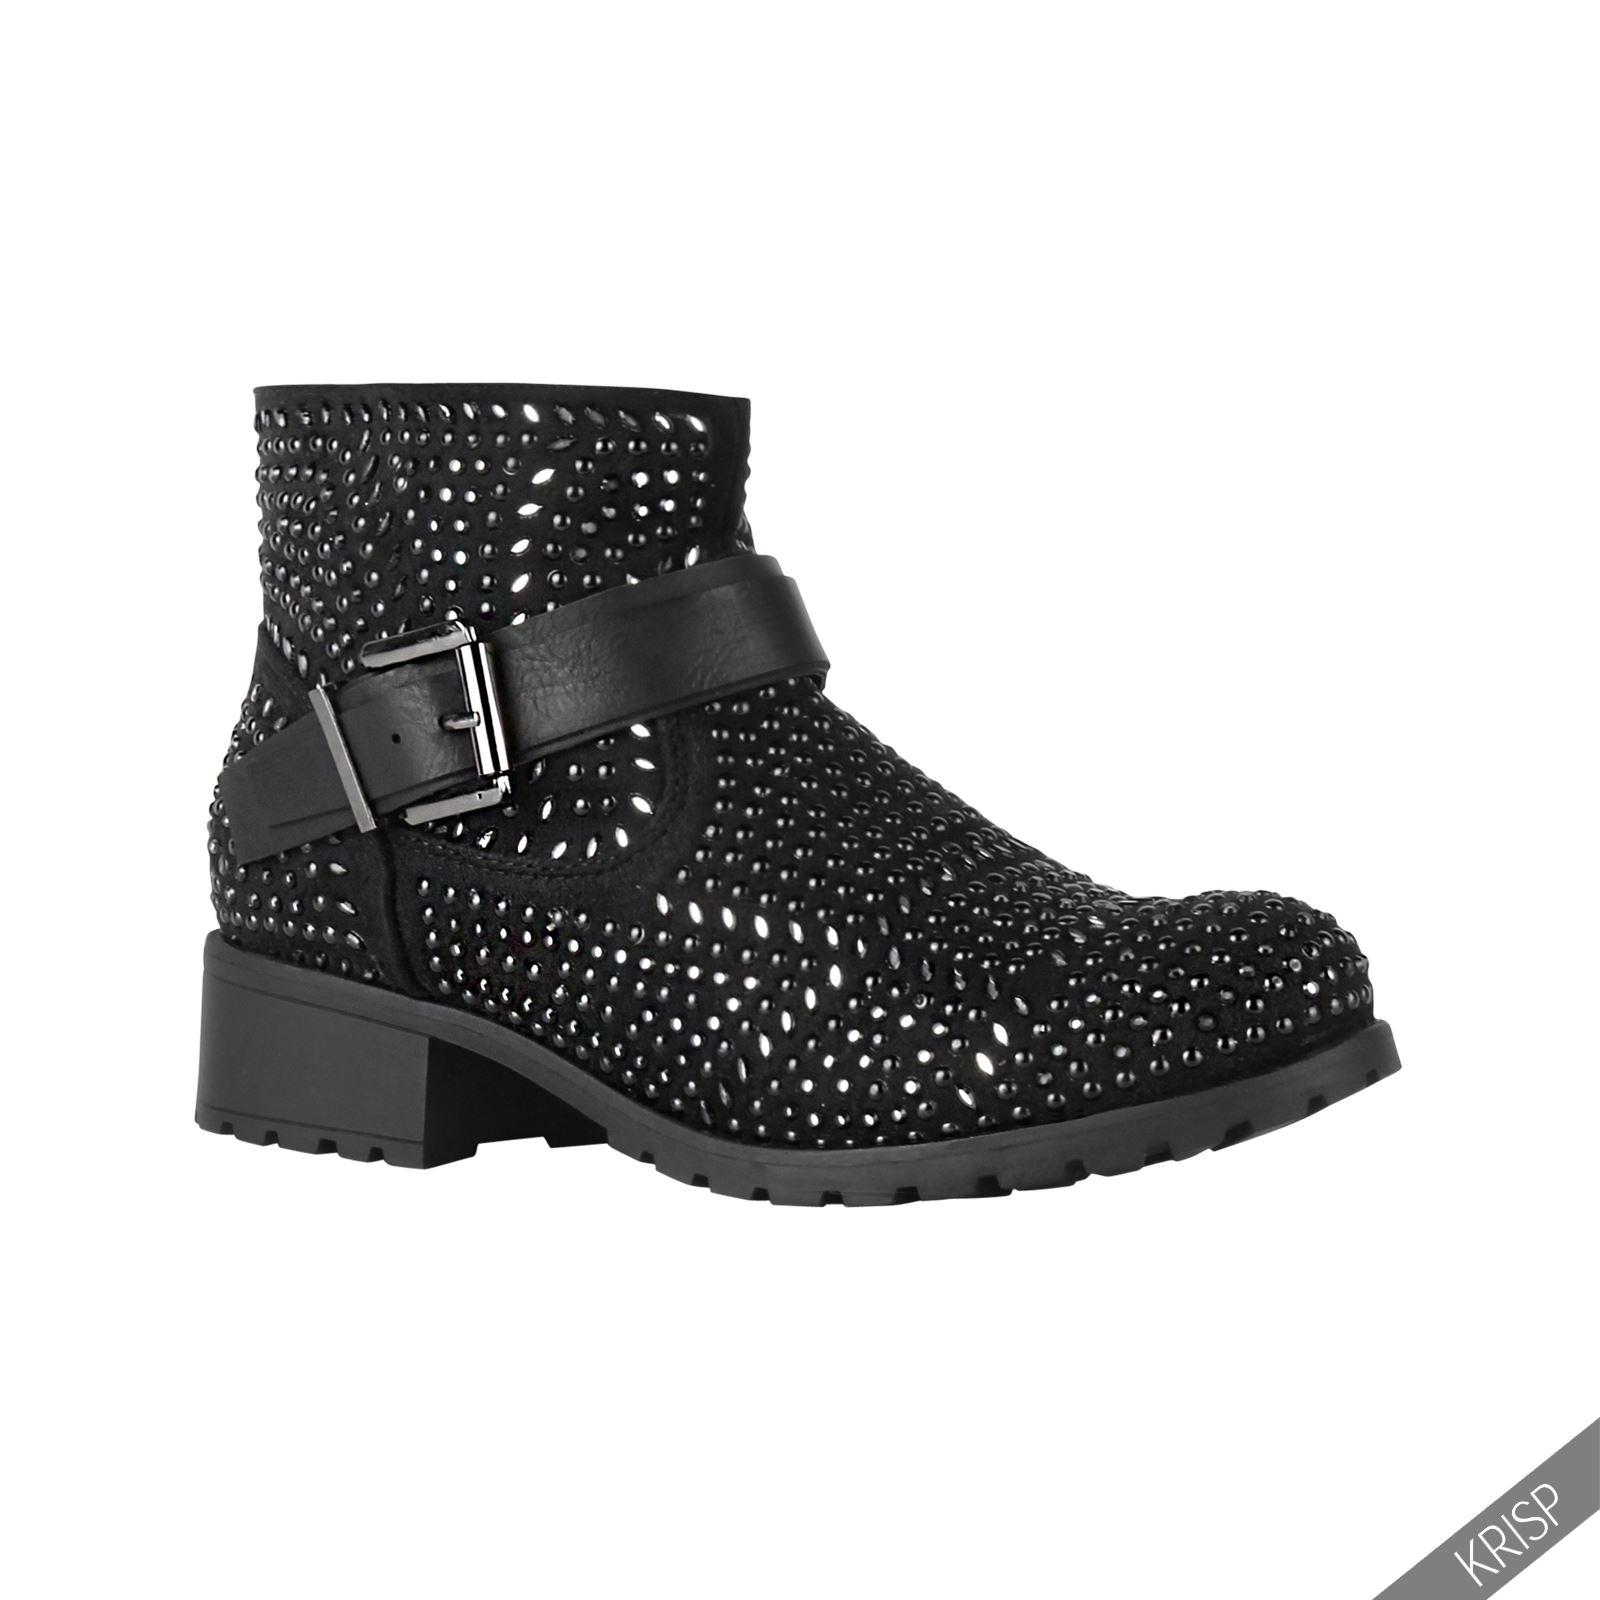 Luxury NEW ROCK Womens Leather BLACK Biker Boot Size 6M M373 Mid Calf | EBay